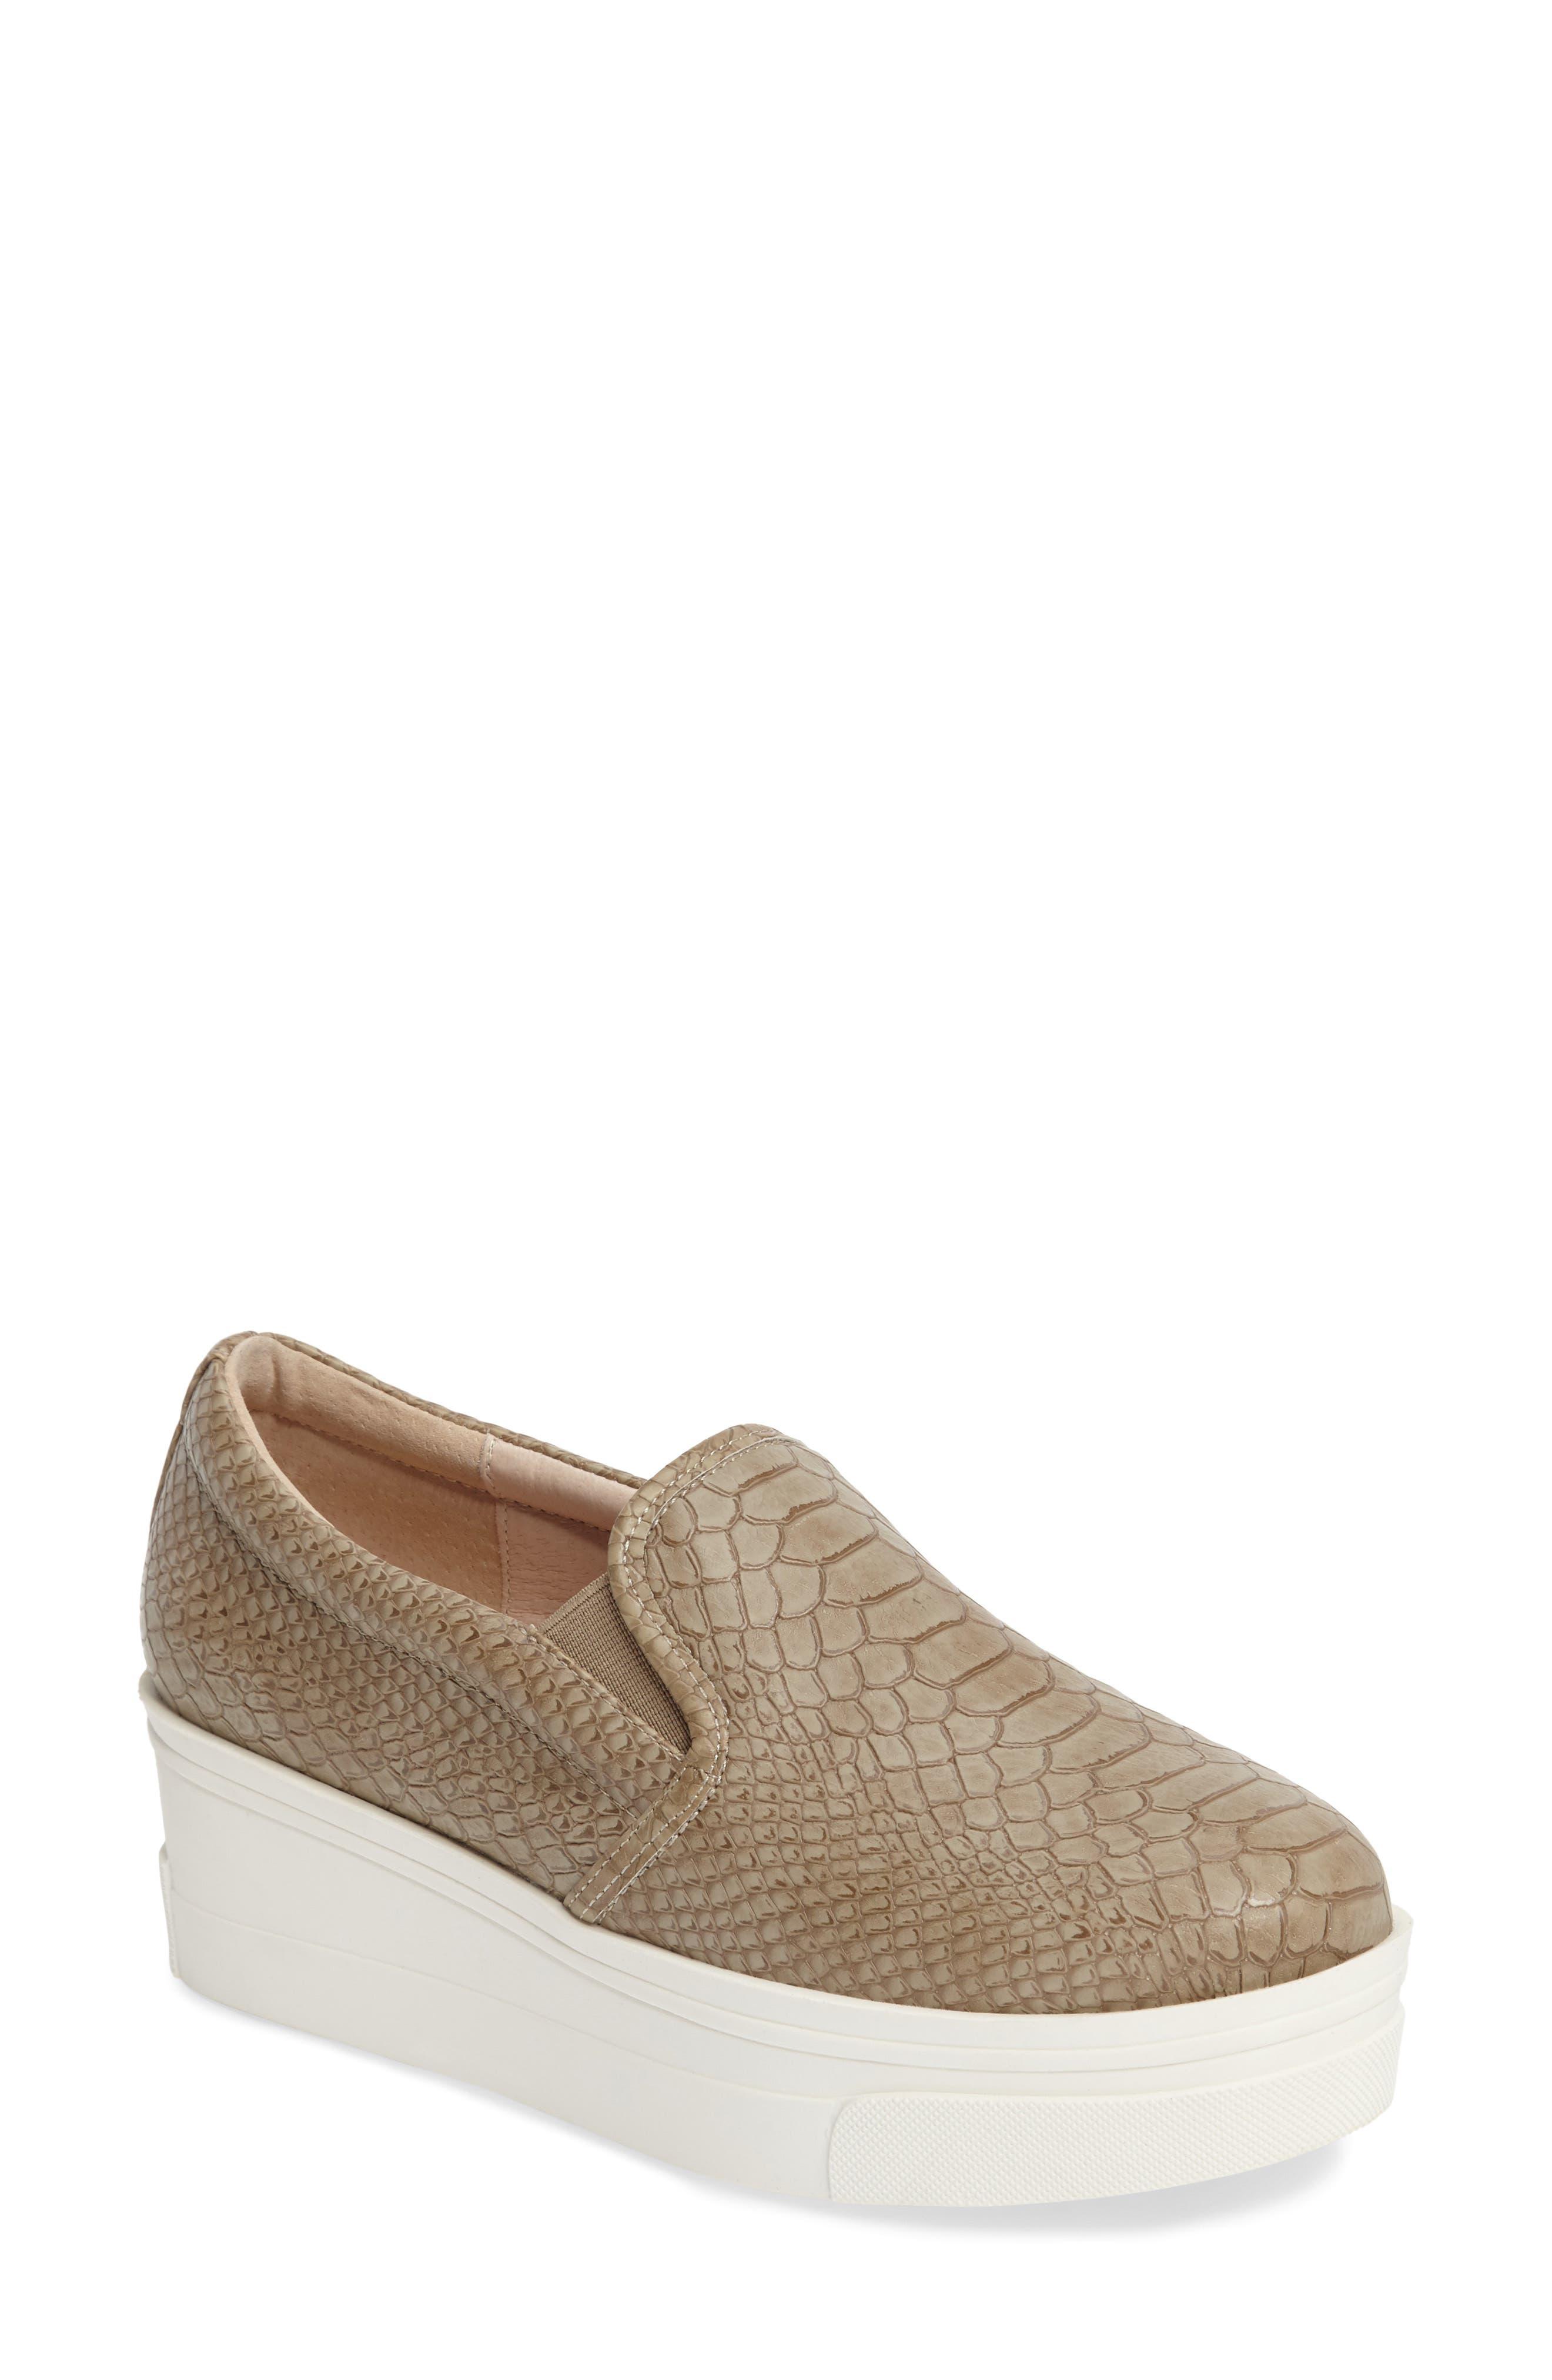 JSlides Genna Slip-On Sneaker (Women)